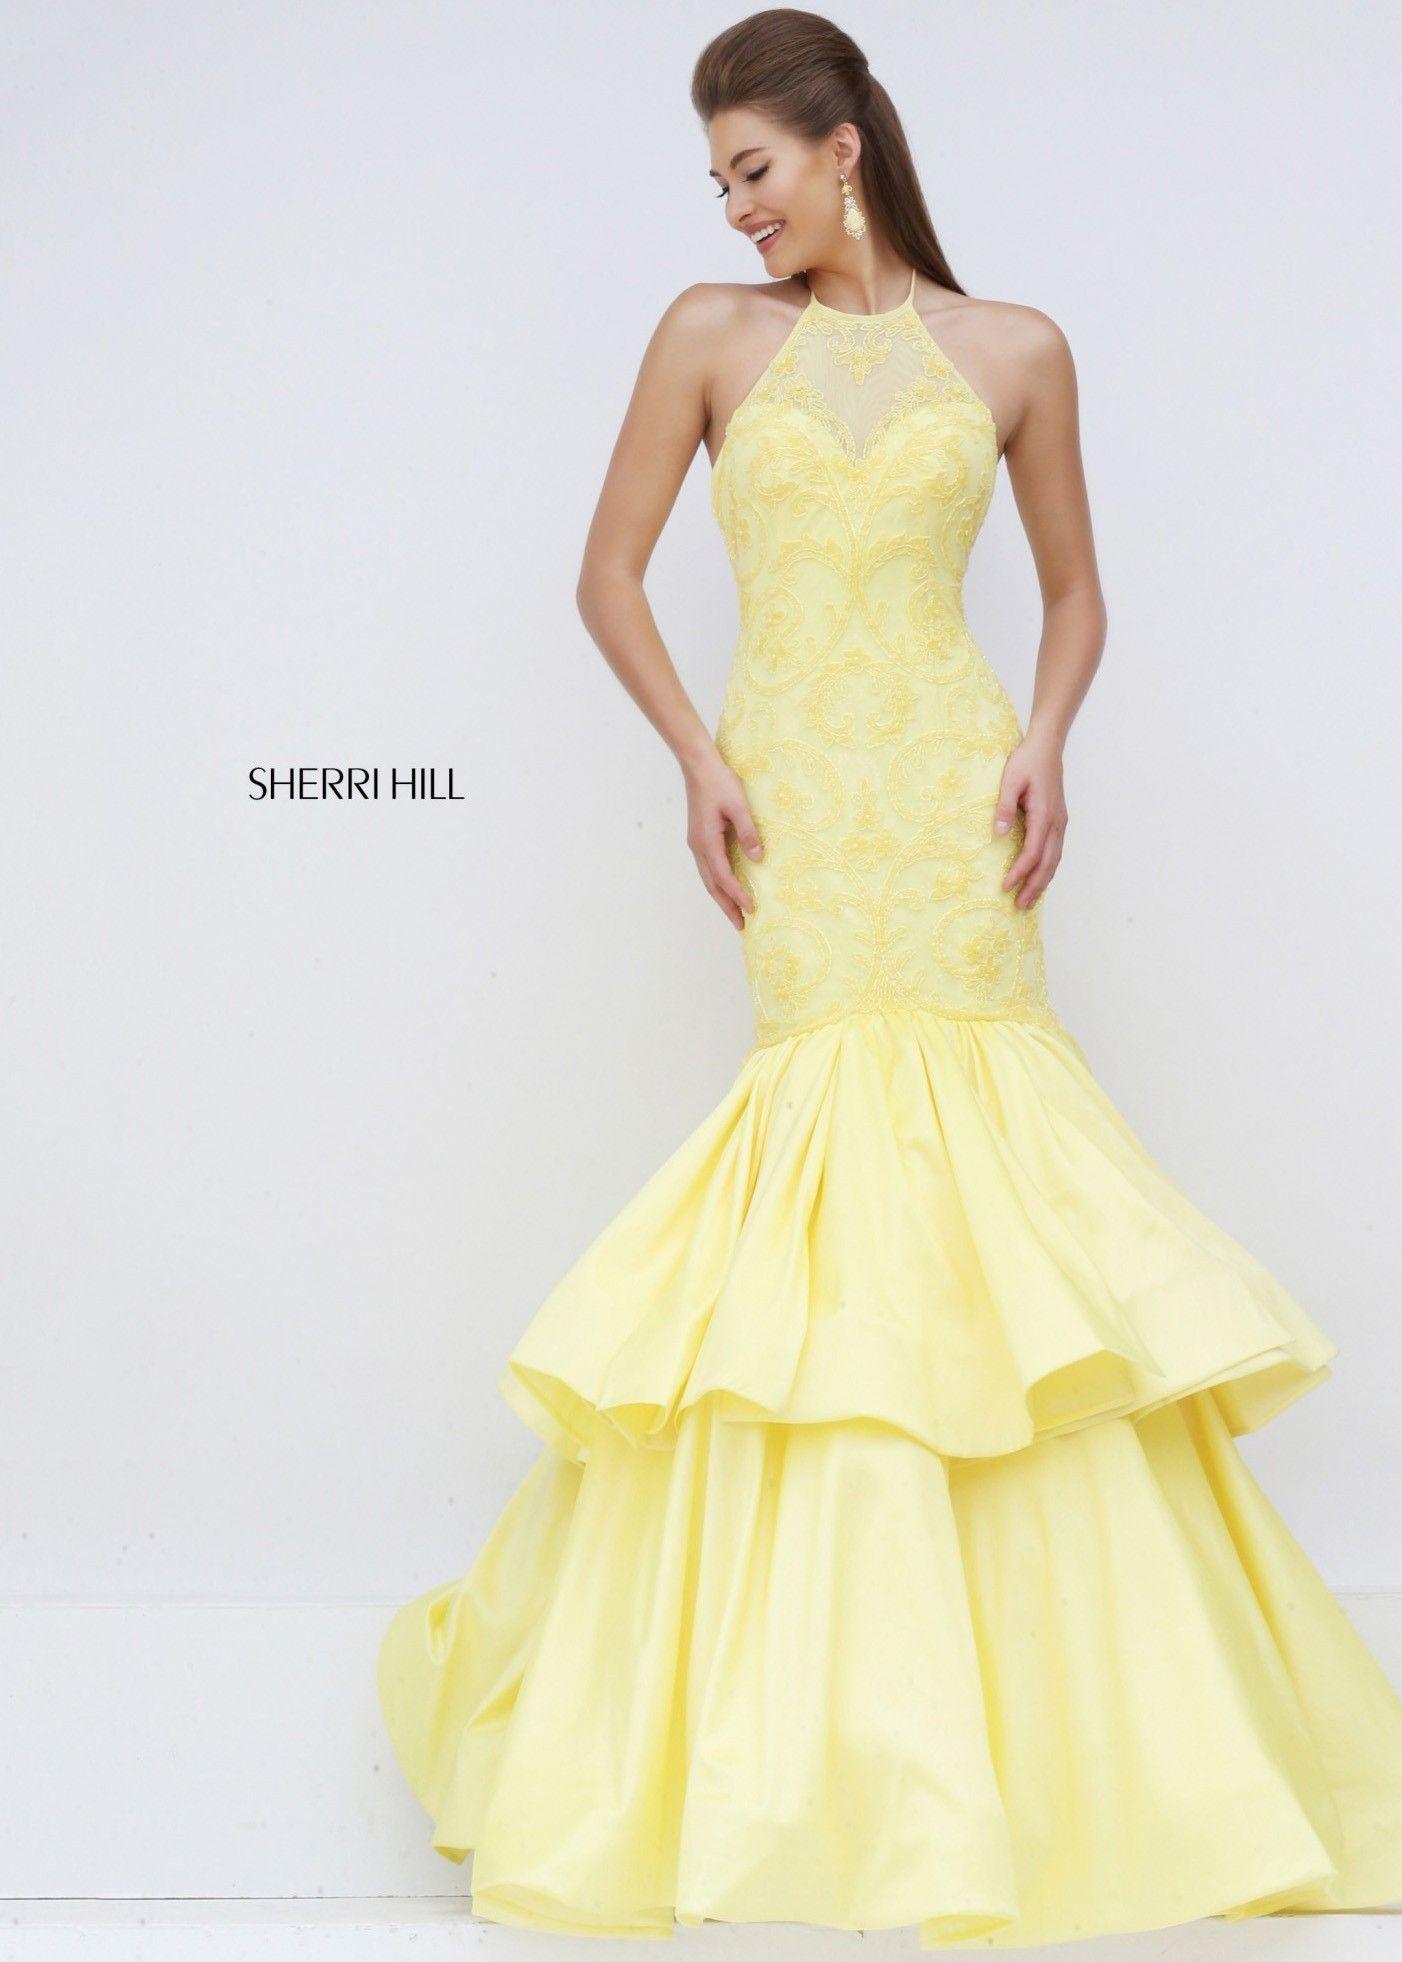 Sherri Hill 50266 Fascinating Yellow Lace Illusion Open Back Mermaid